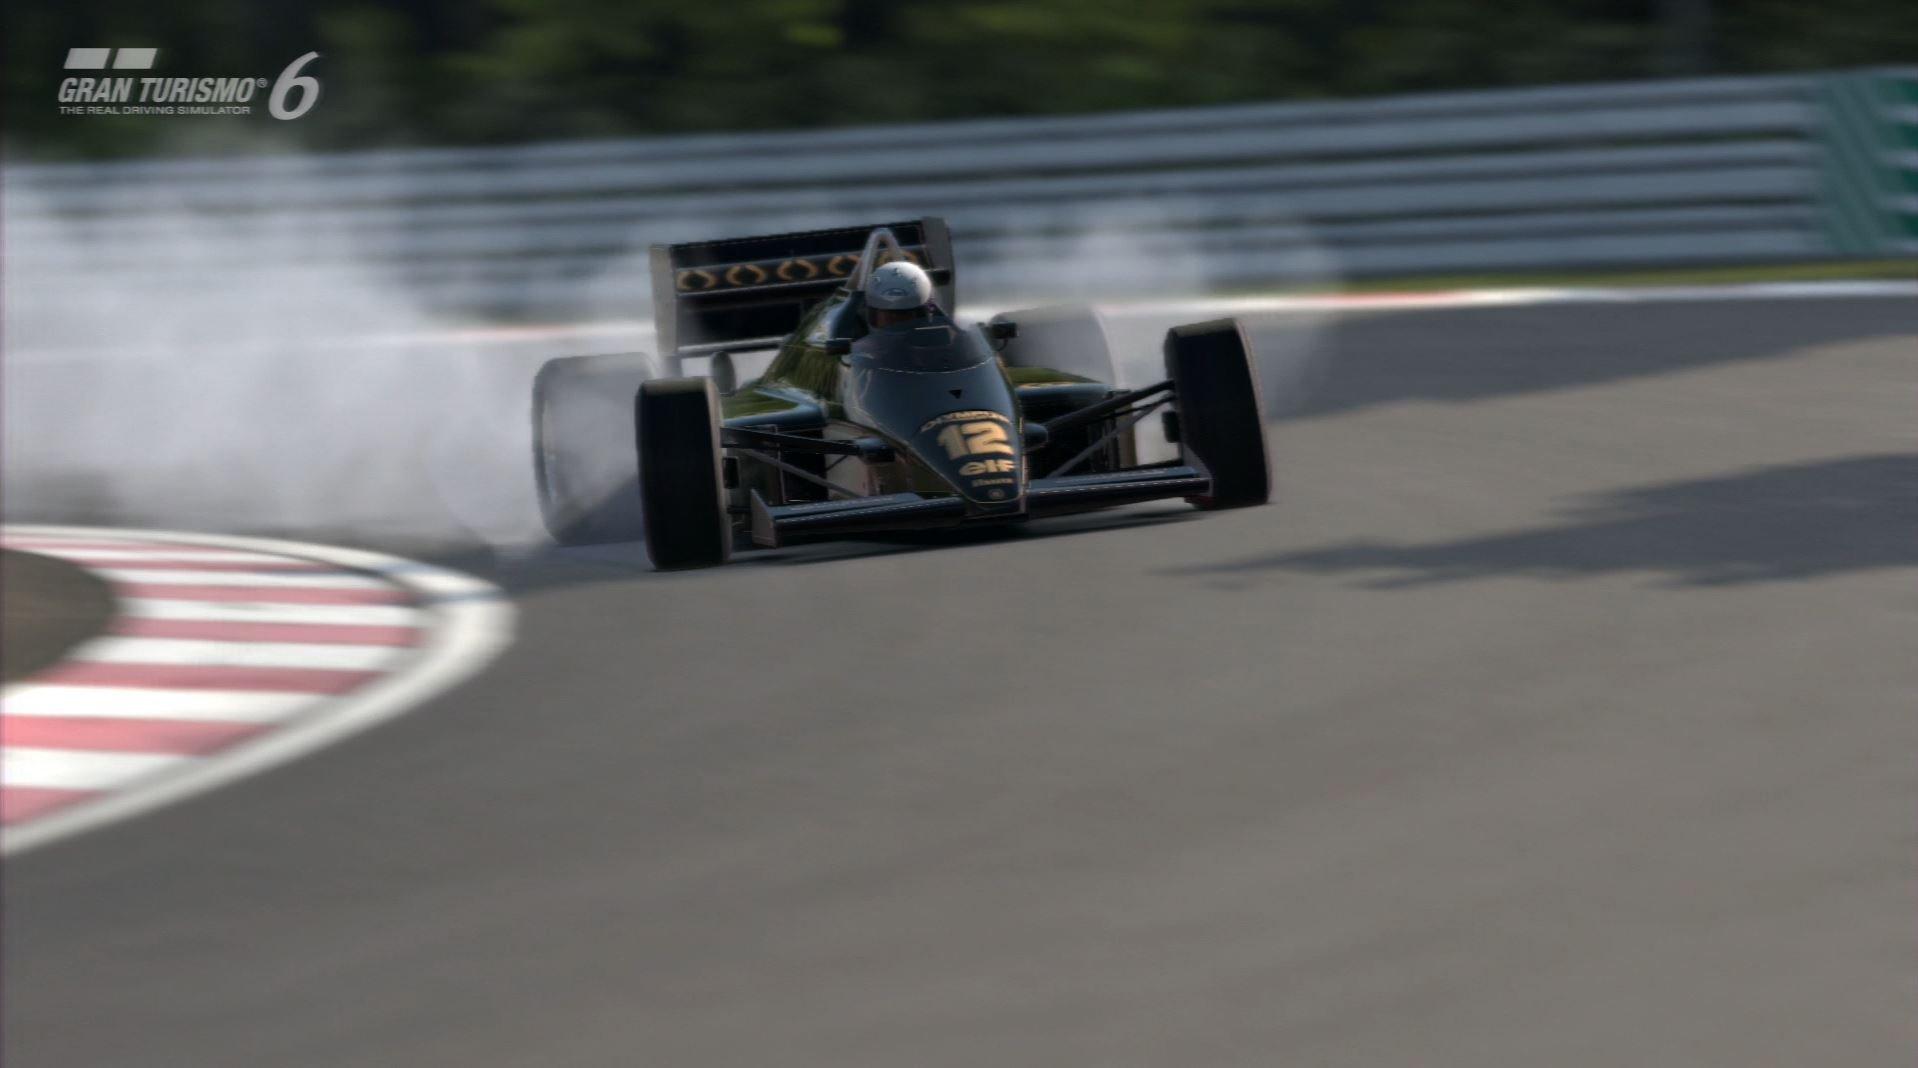 Gran Turismo 6 (GT6) Aryton Senna Content Impressions